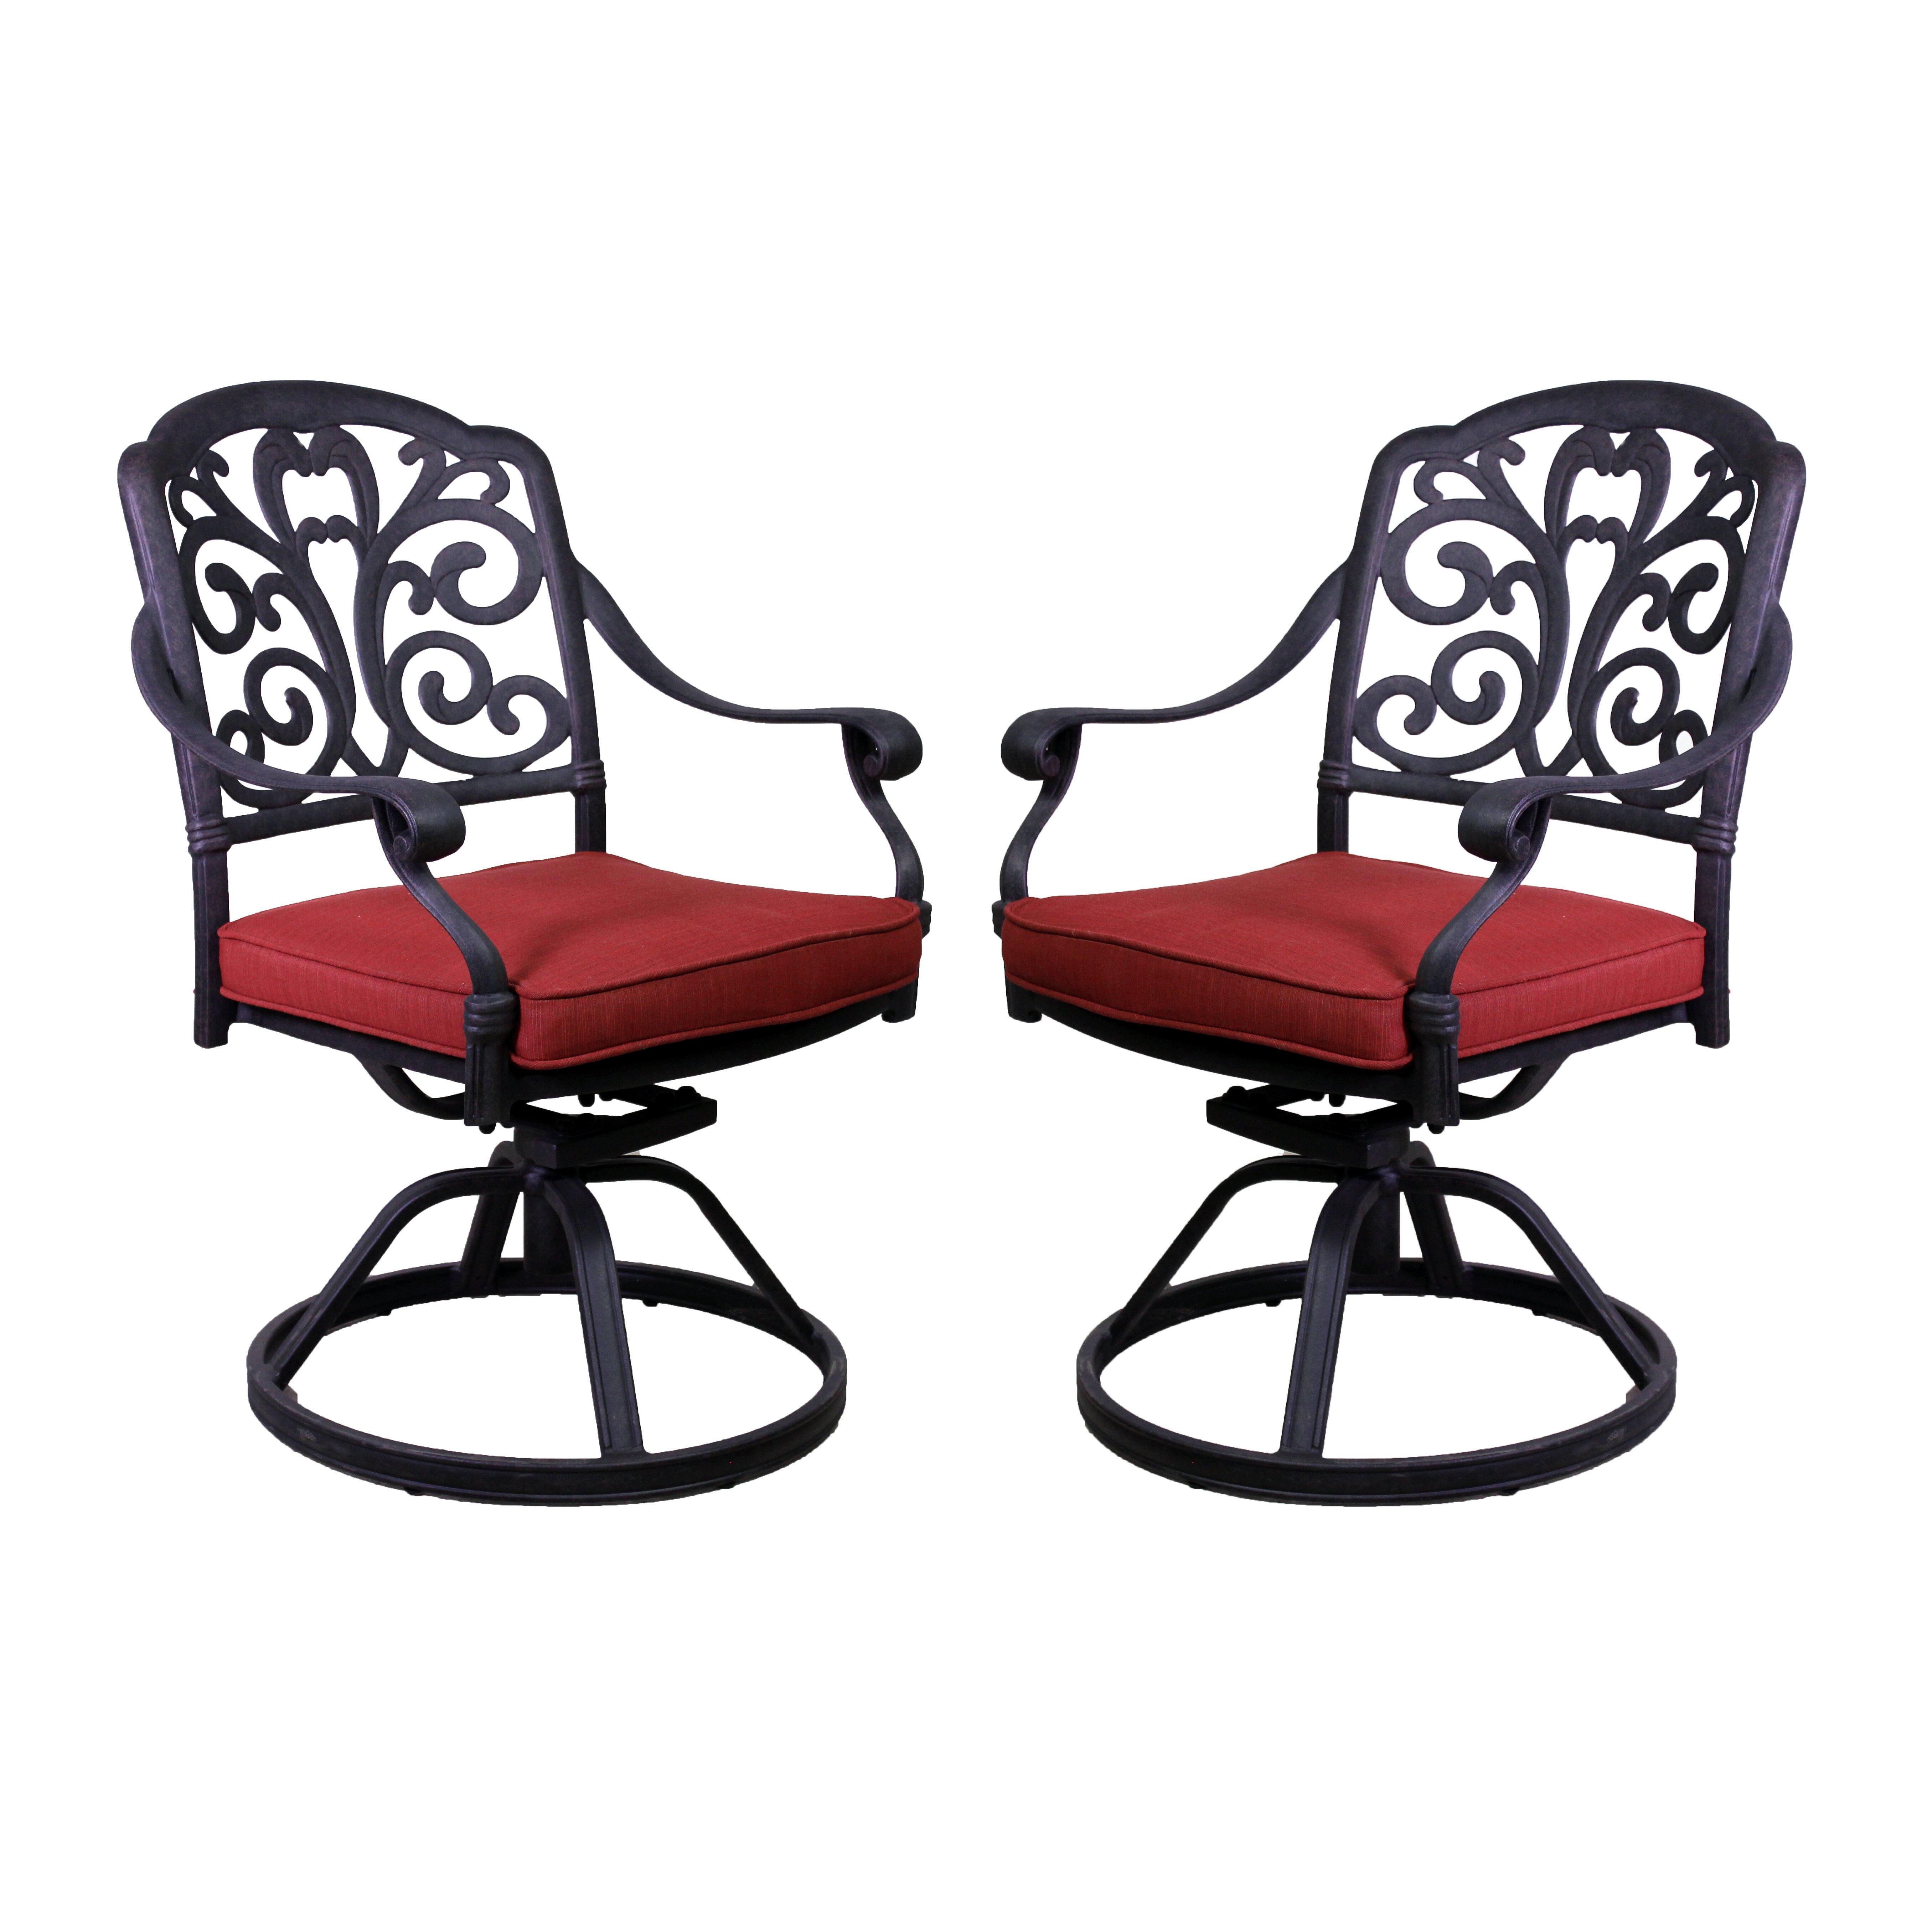 ... Rocking Chair Set with Dupione Sunbrella Cushion by California Outdoor